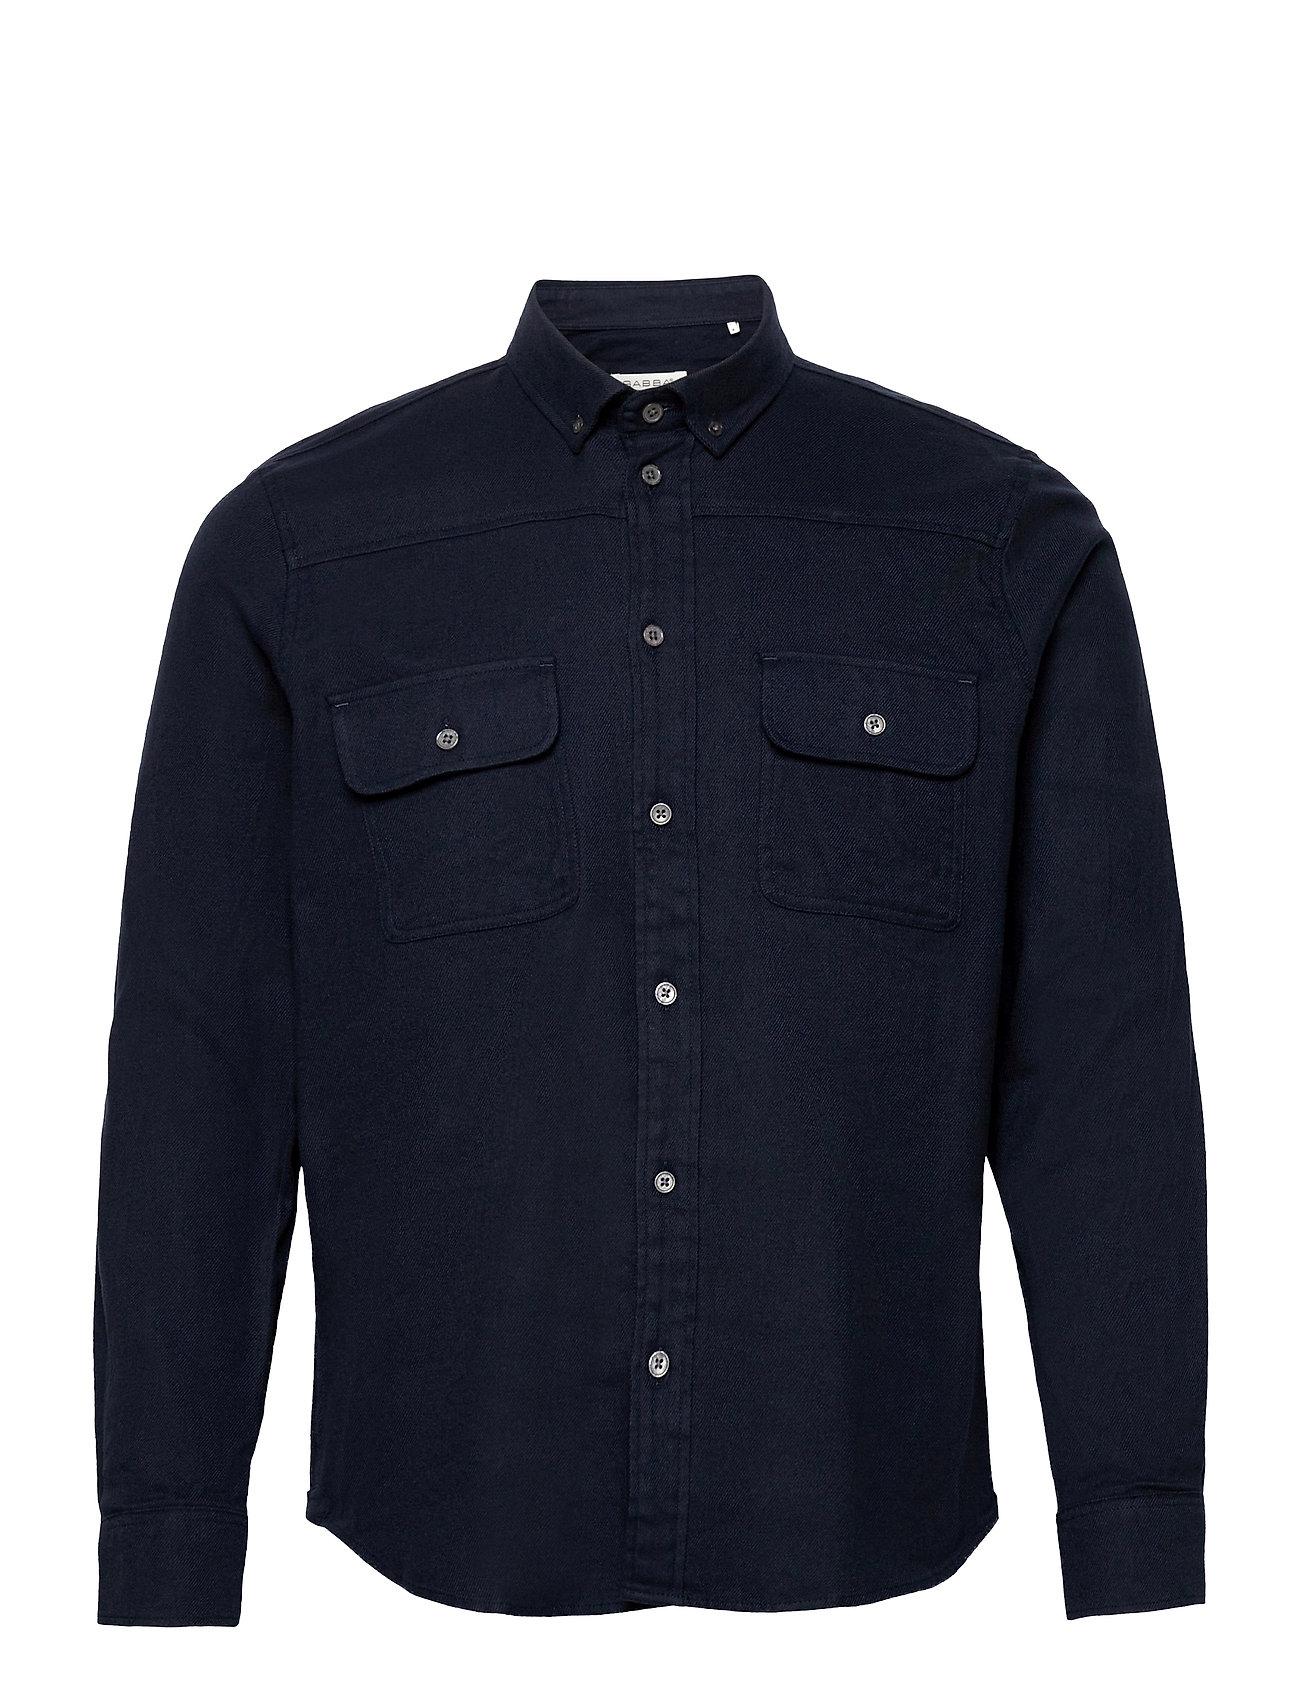 Image of Harbin Ls Shirt Skjorte Casual Blå Gabba (3493873955)